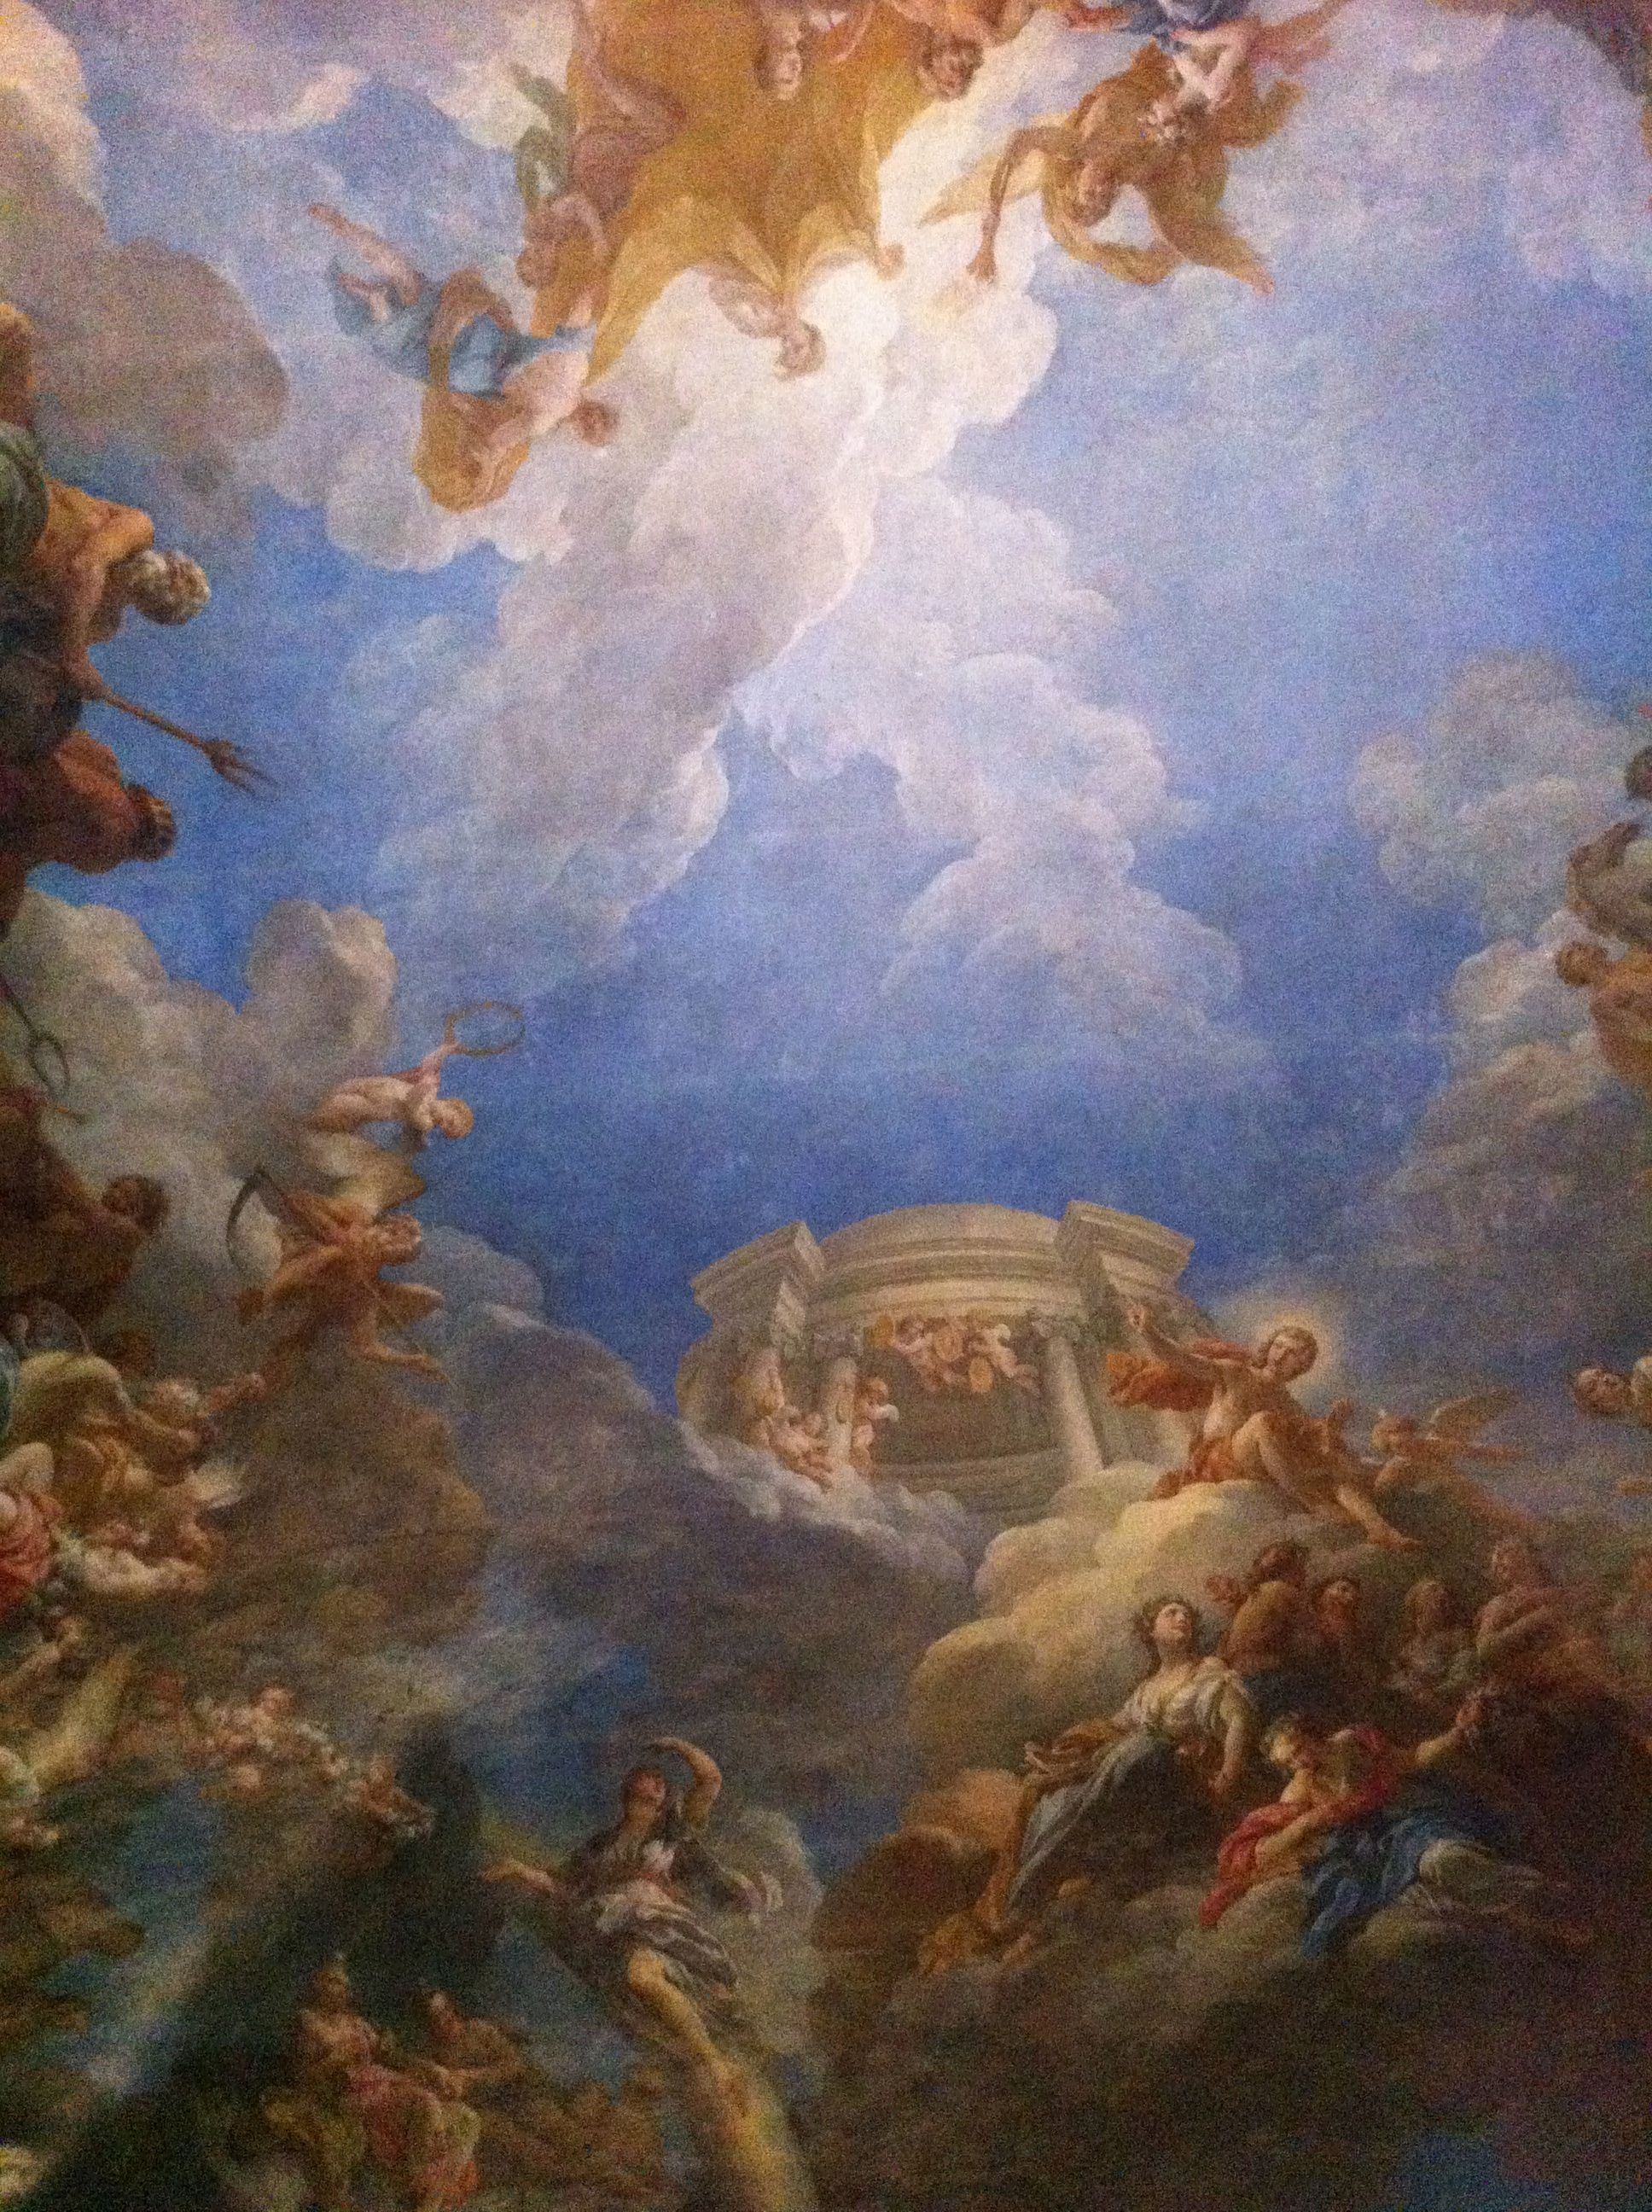 Artistic Aesthetic Renaissance Aesthetic Wallpaper Novocom Top